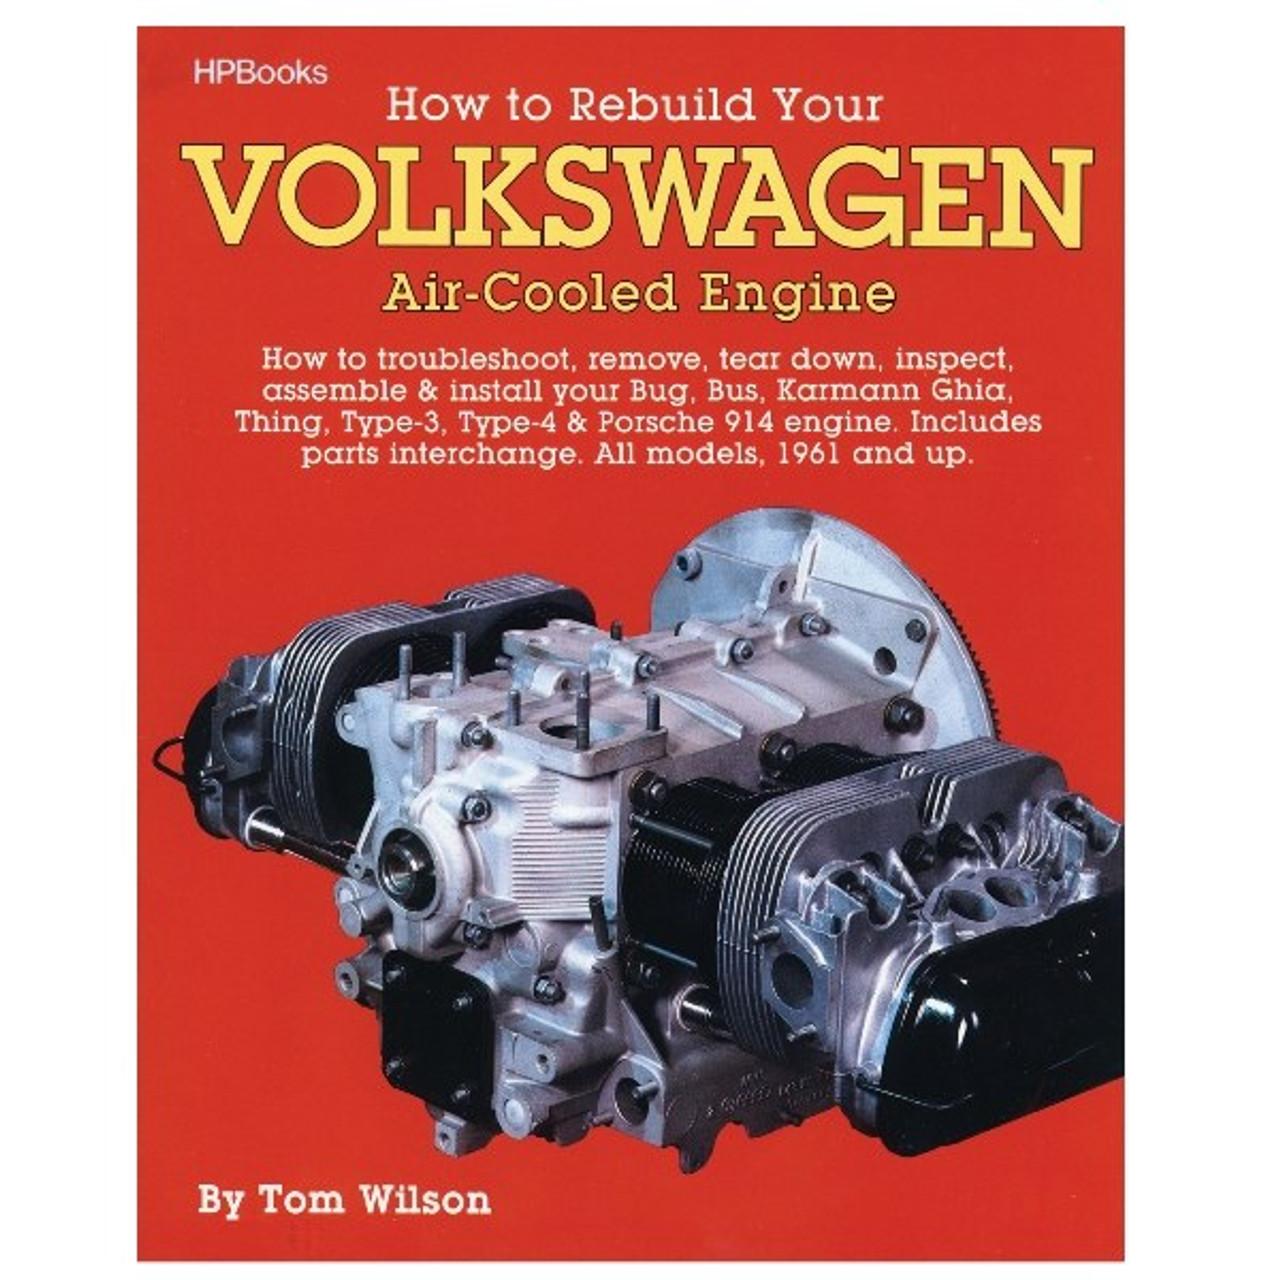 how to rebuild vw air cooled engines by tom wilson shop manual rh mooreparts com Volkswagen Golf 2000 volkswagen beetle engine manual